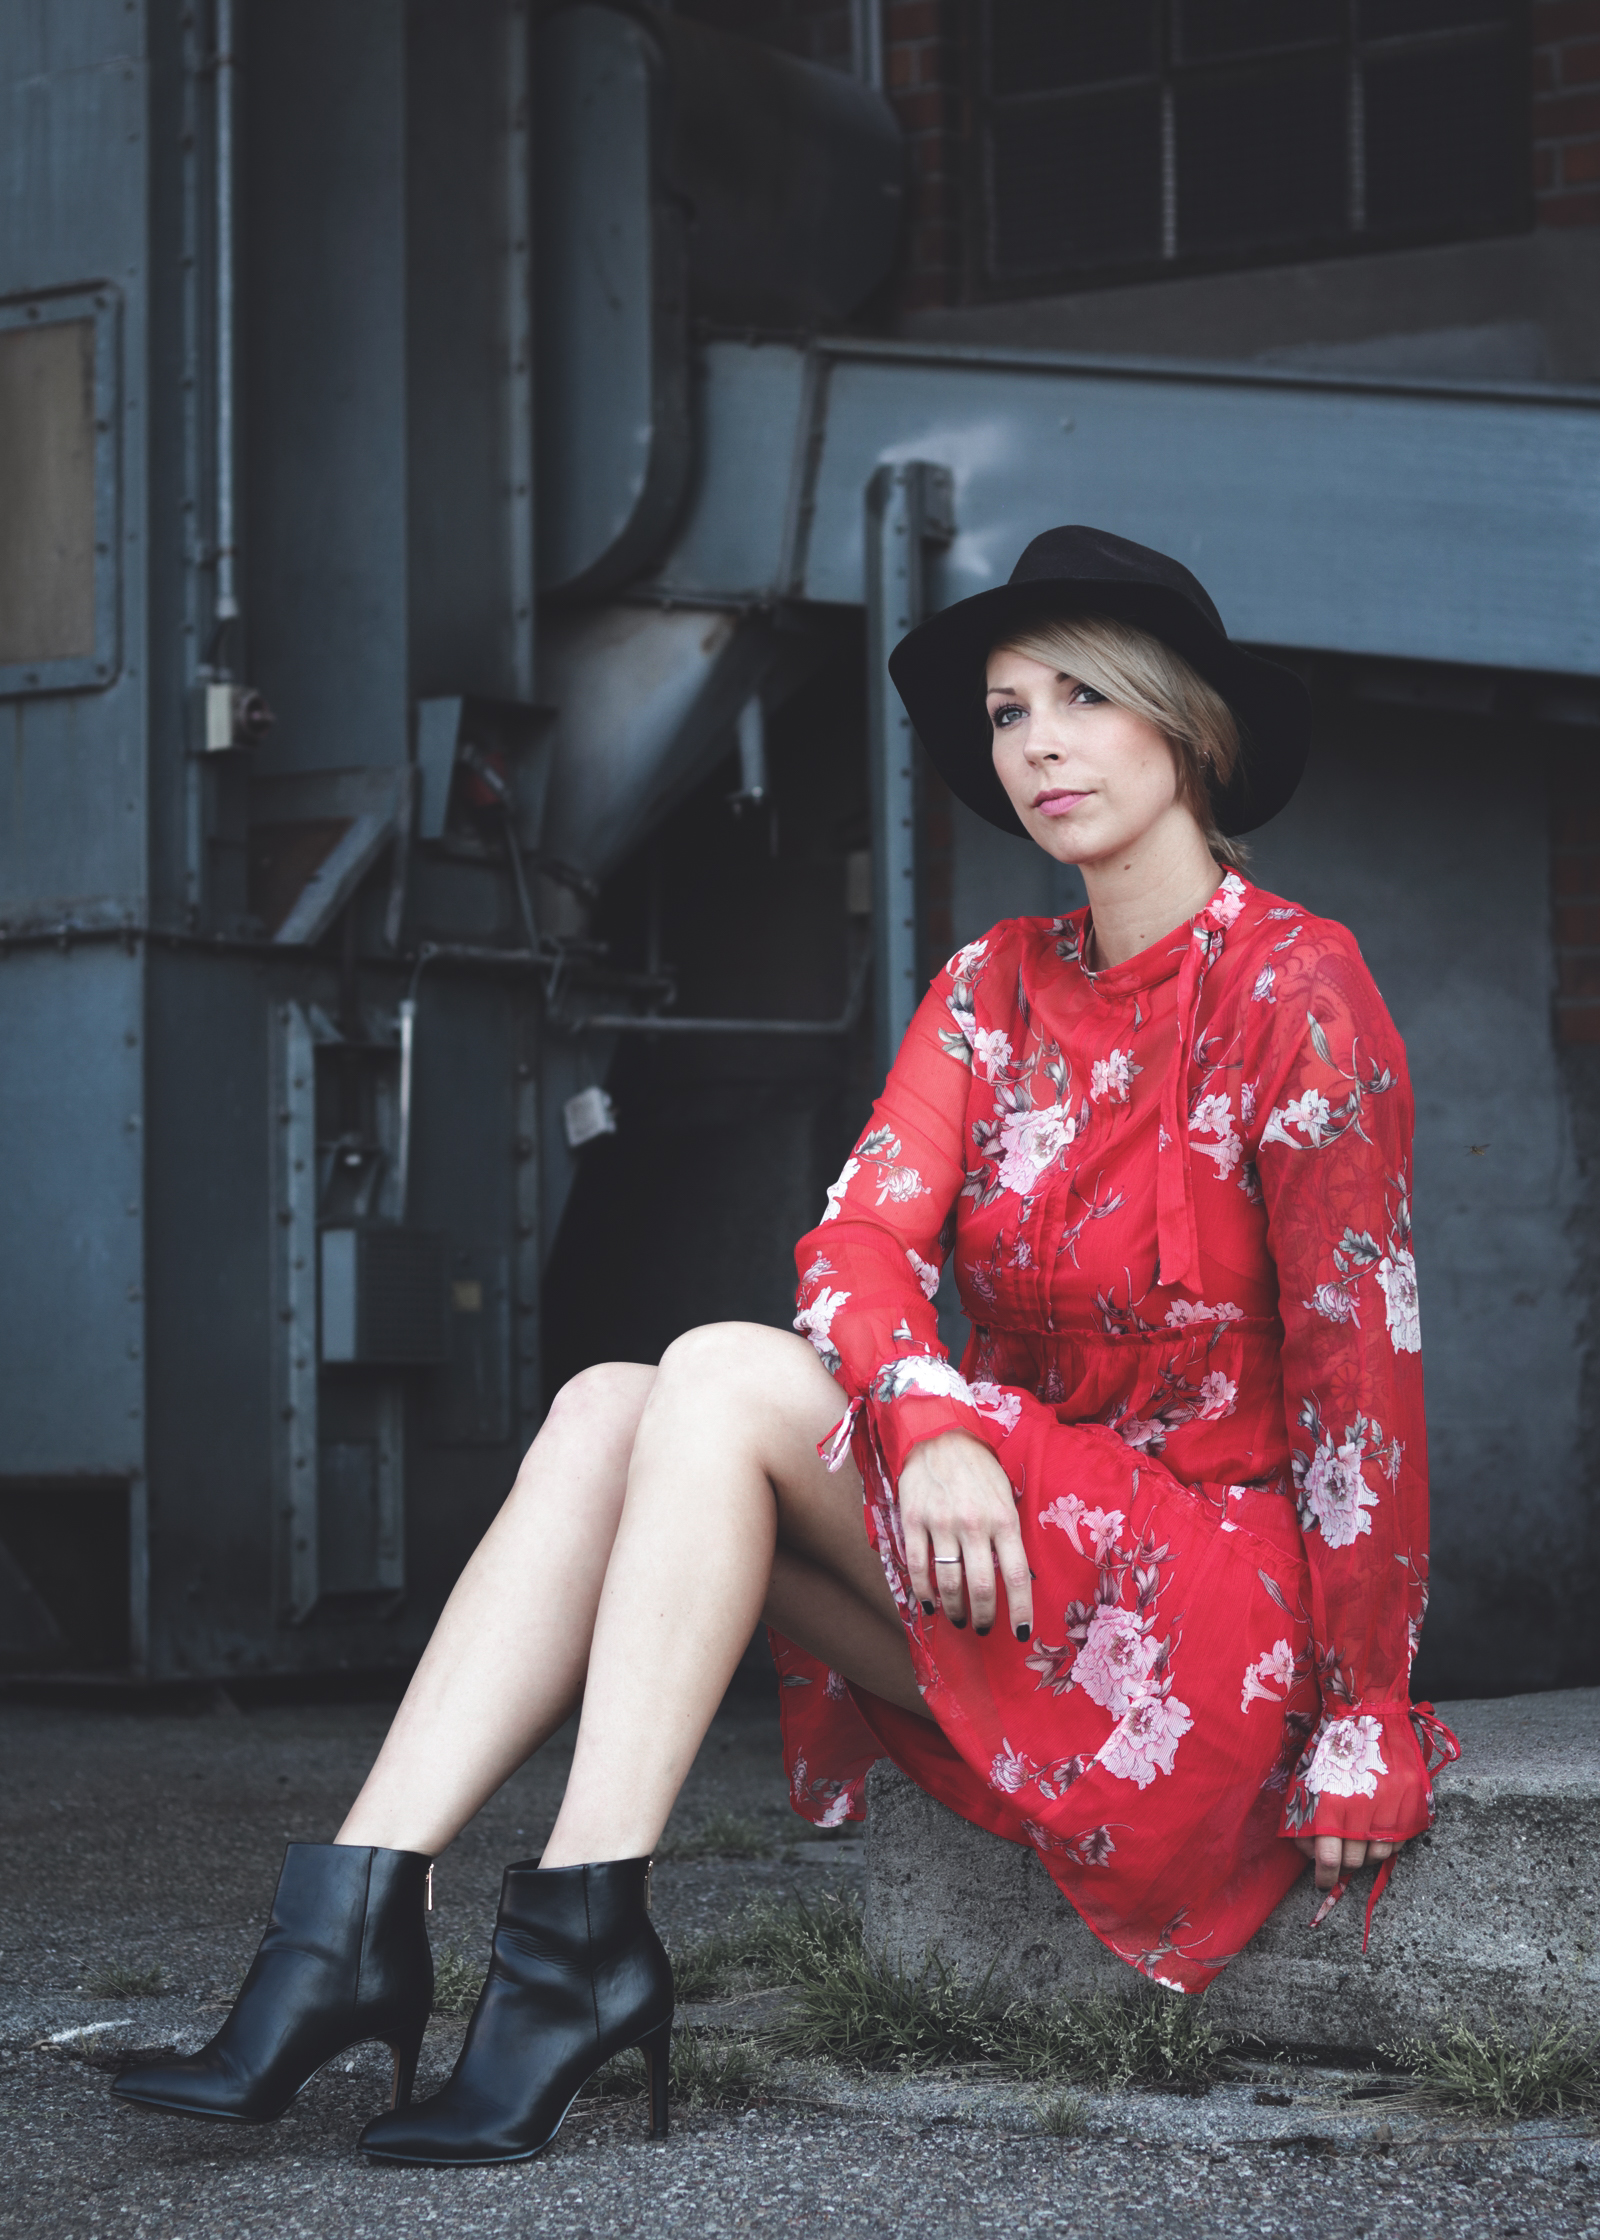 Fashionblogger Outfit Rotes Kleid Mit Blumen Transparent Lederjacke Schwarze Stiefeletten Hut 15 Lavie Deboite